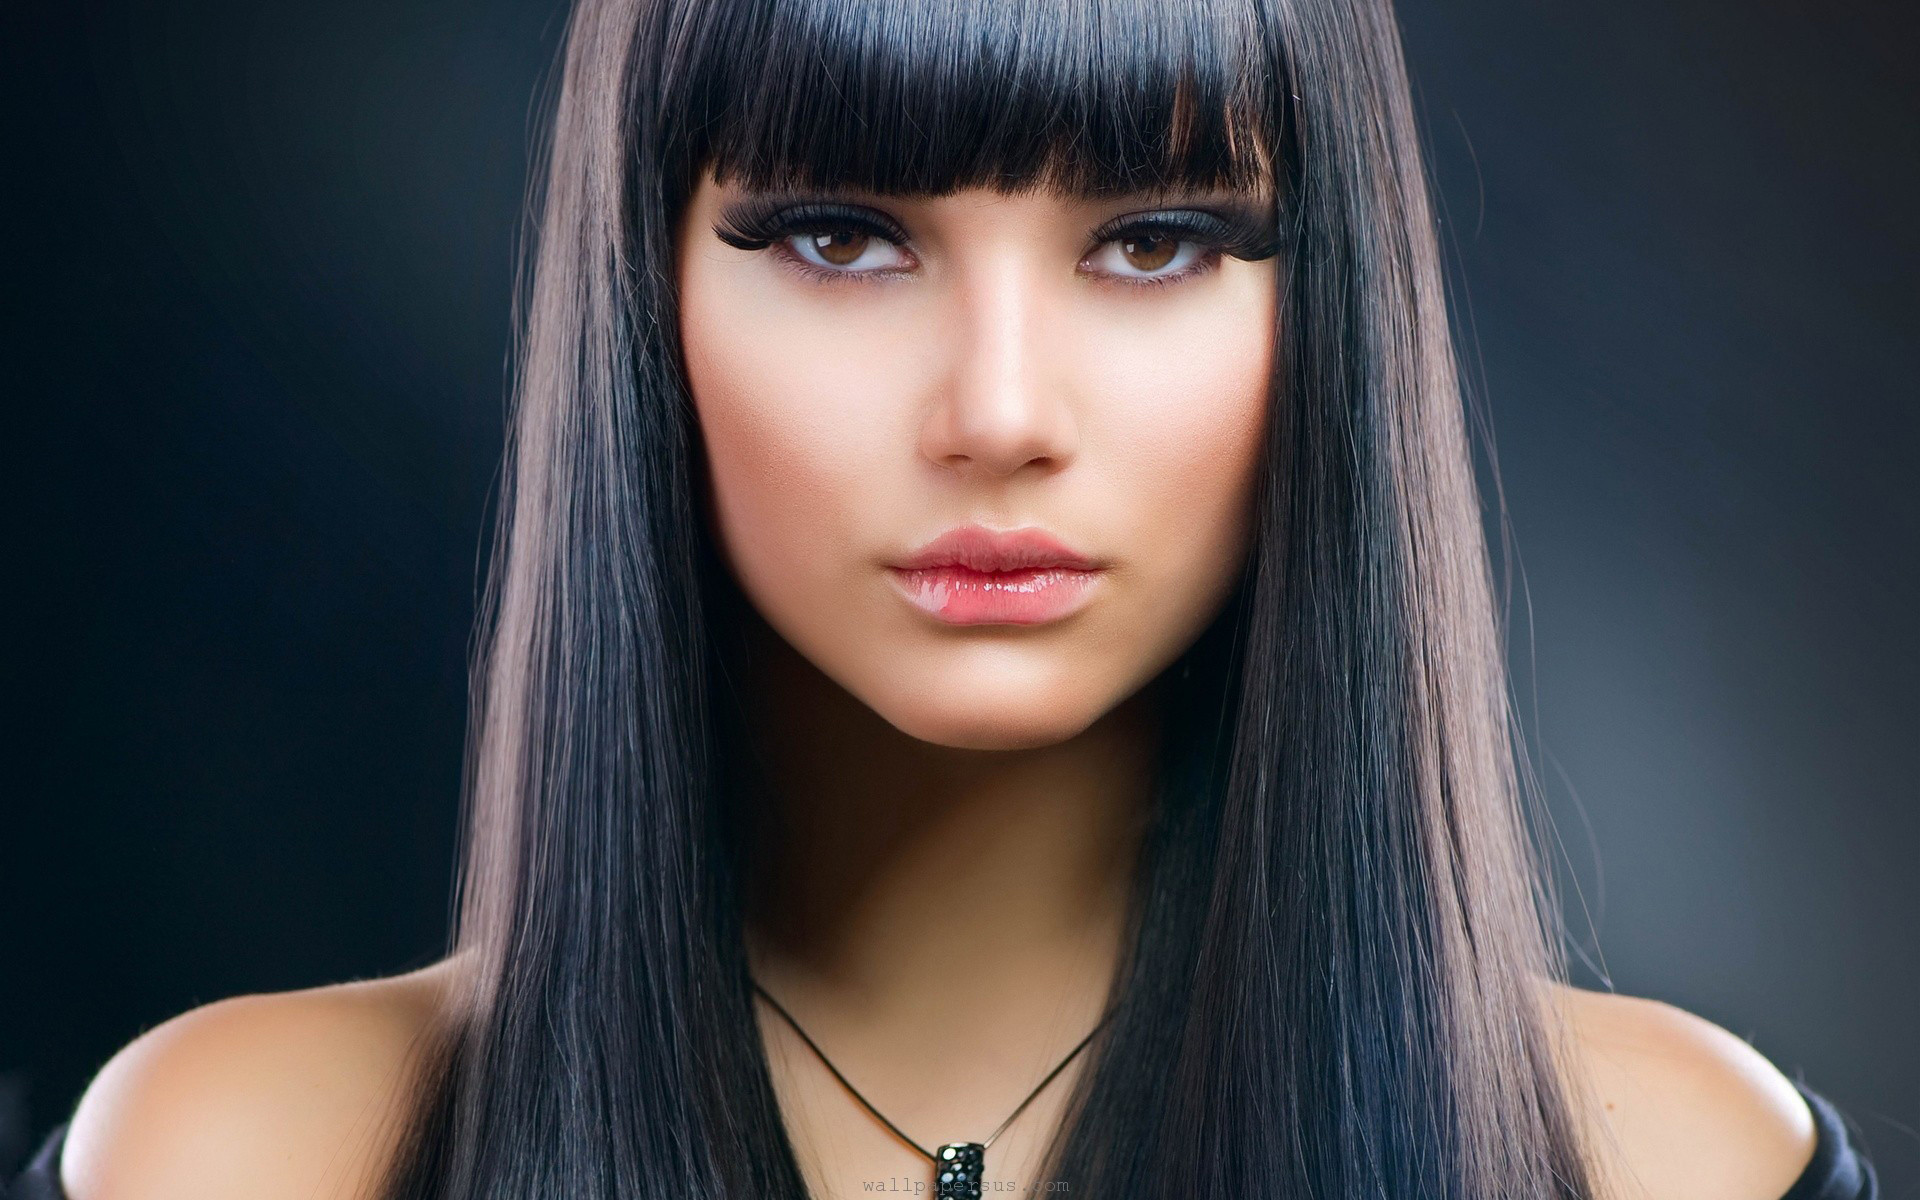 … best hair salon dallas, best hair salon hurst bedford and euless, best hair  stylist, best hair stylists, best hair salons, best heair design, …